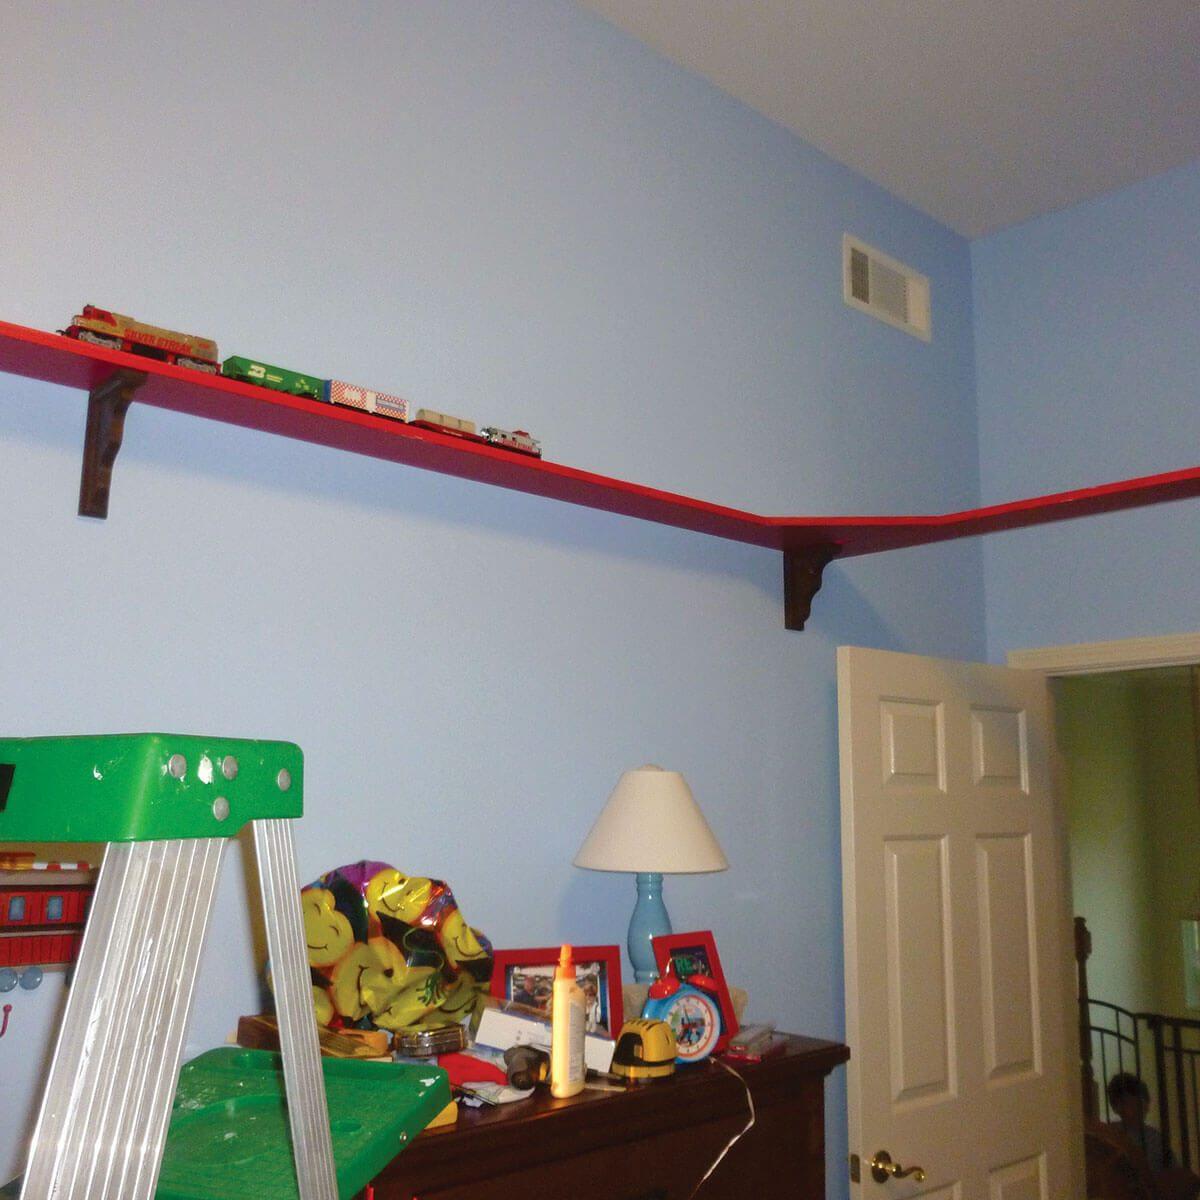 Building bedroom train track